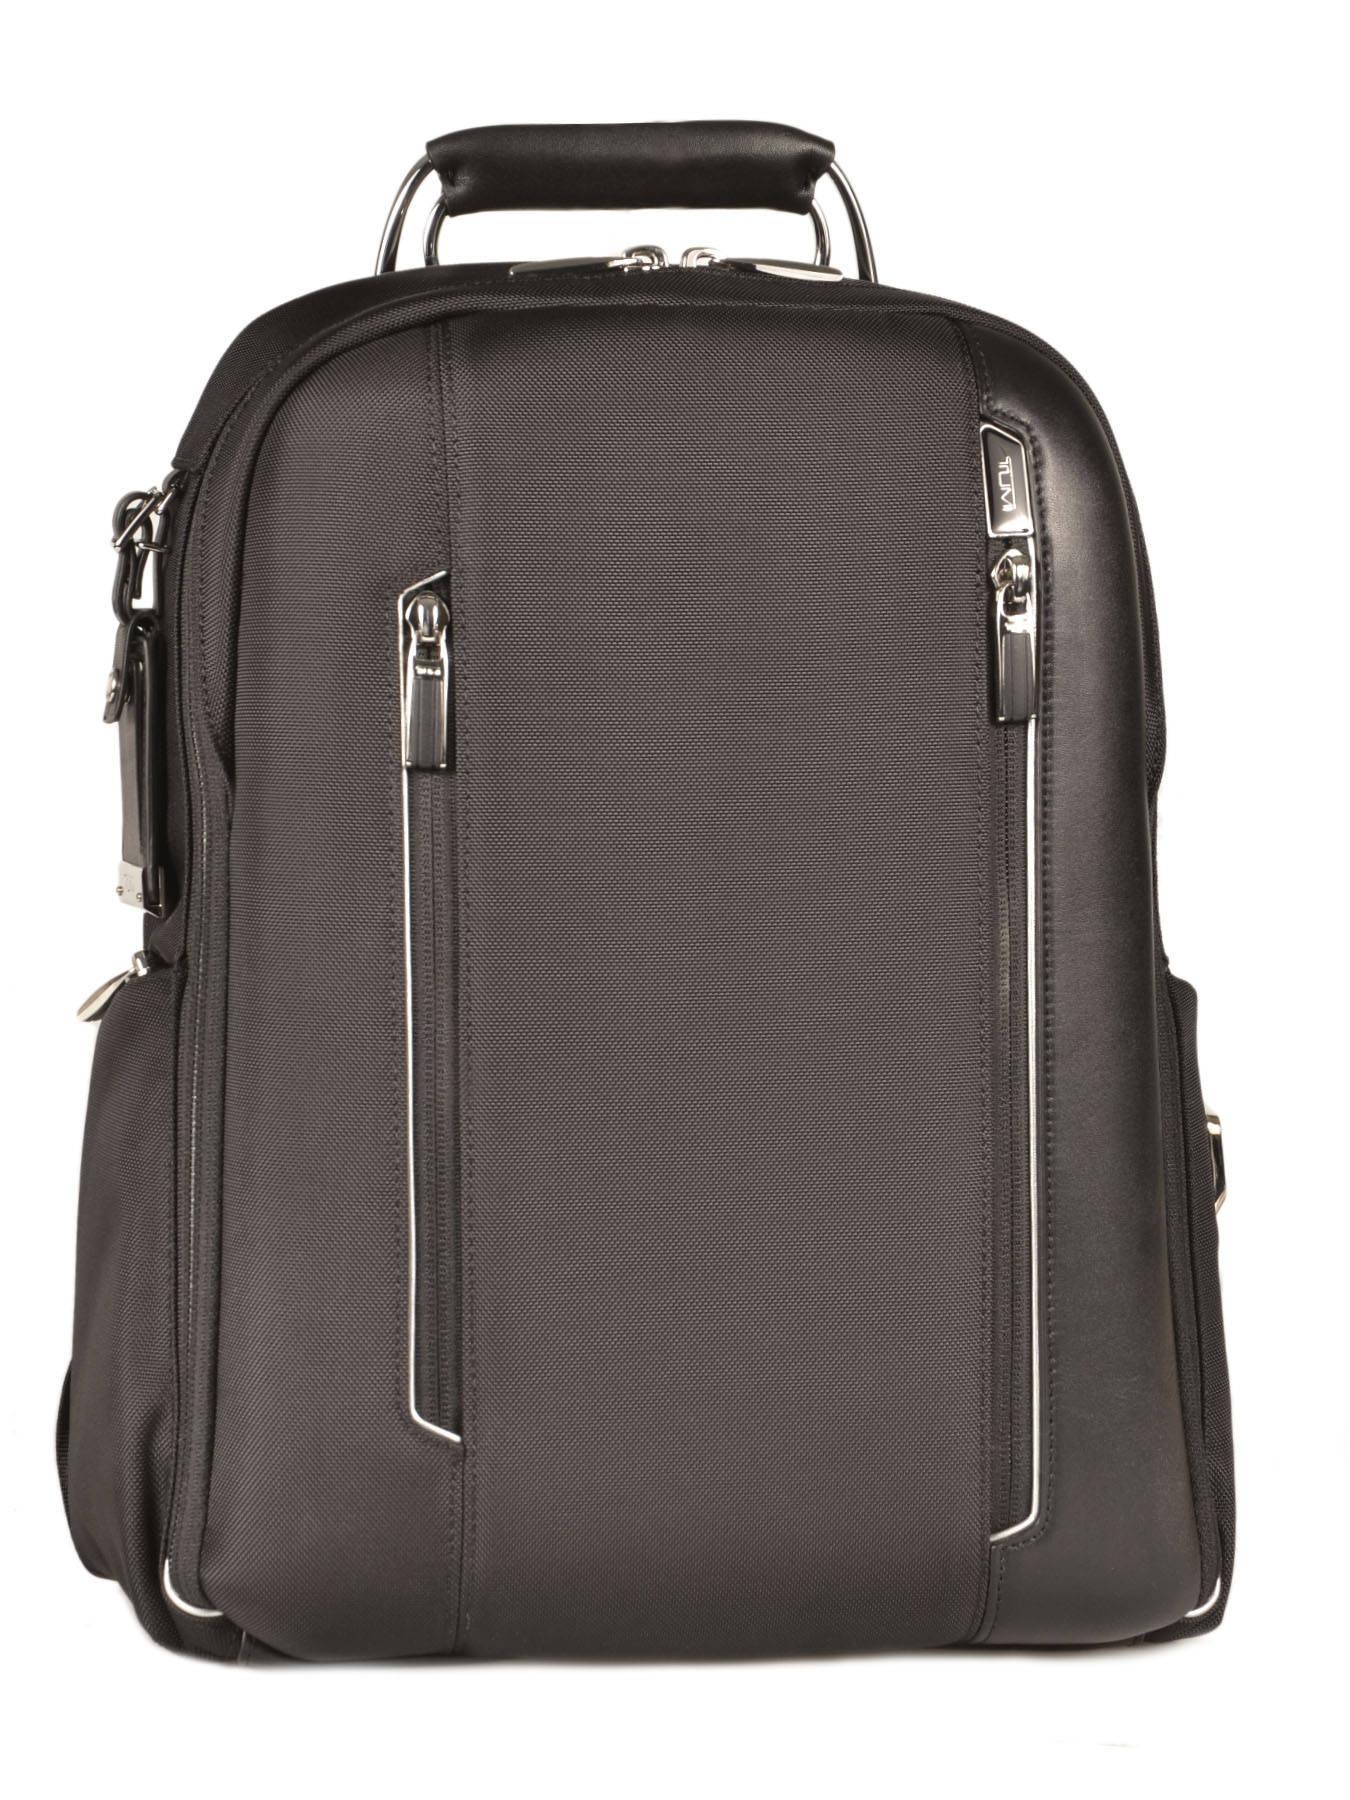 sac dos tumi black arrive 255011. Black Bedroom Furniture Sets. Home Design Ideas